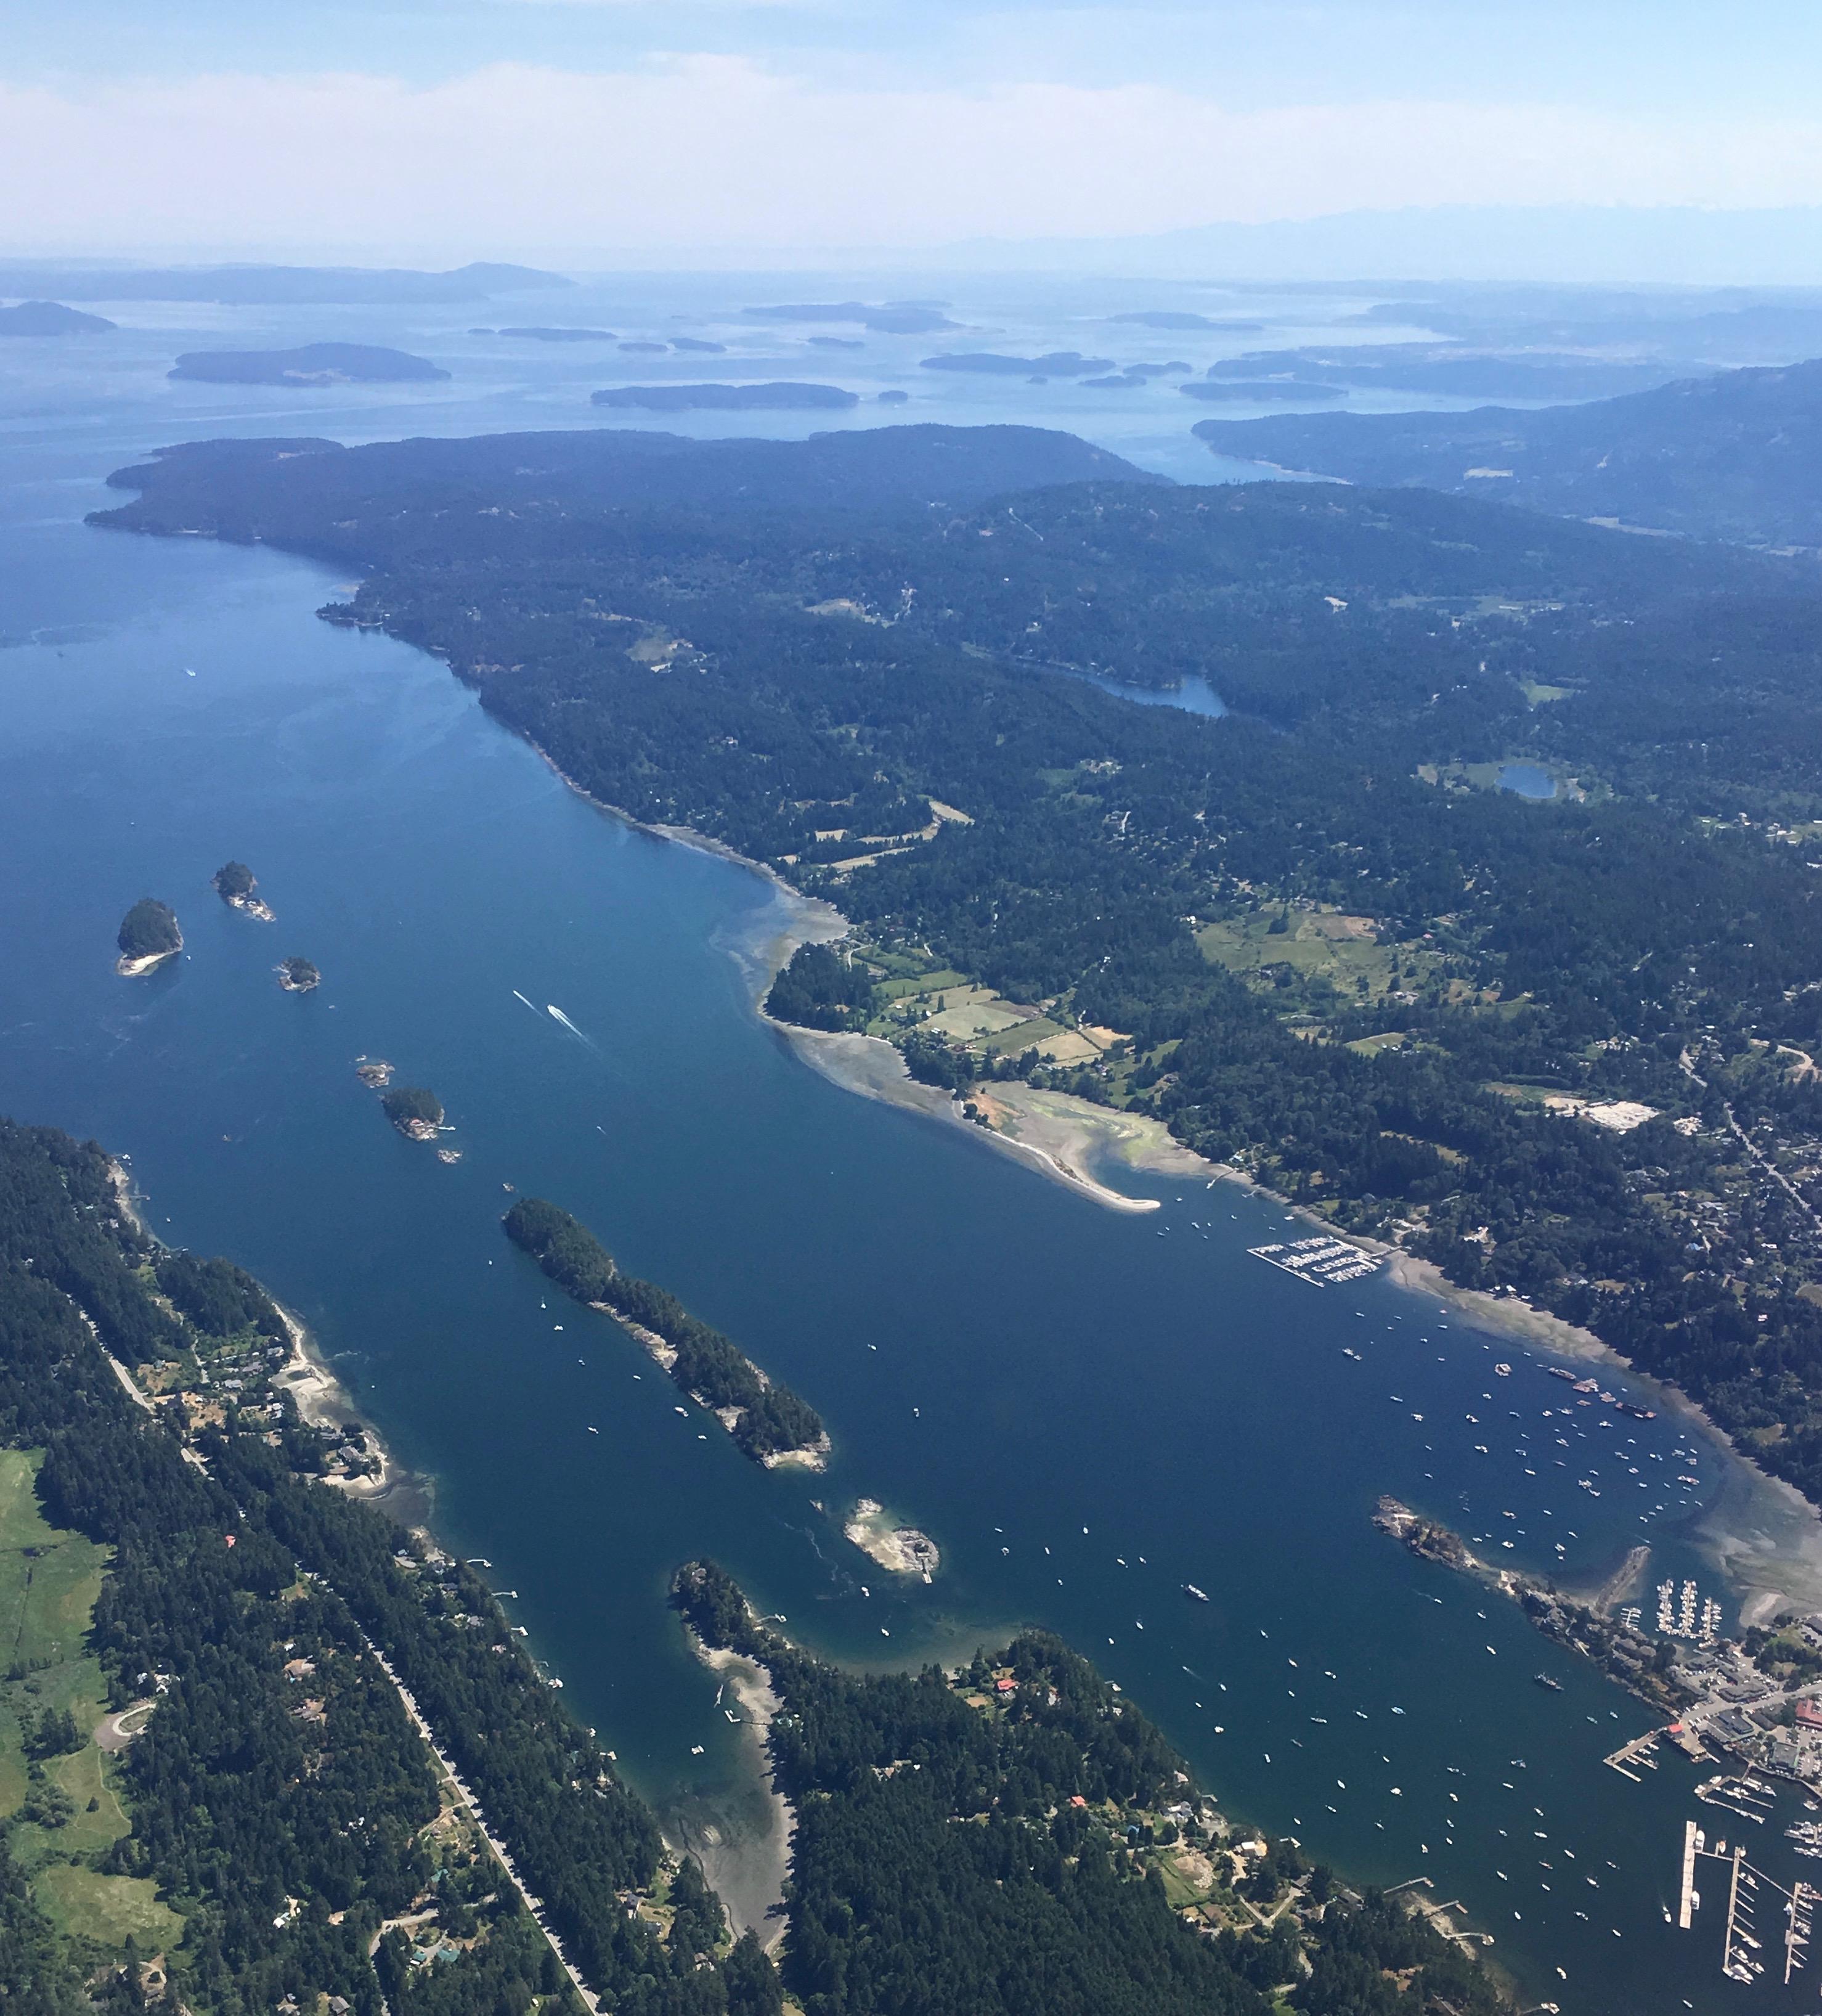 Goat Island British Columbia Canada Private Islands For